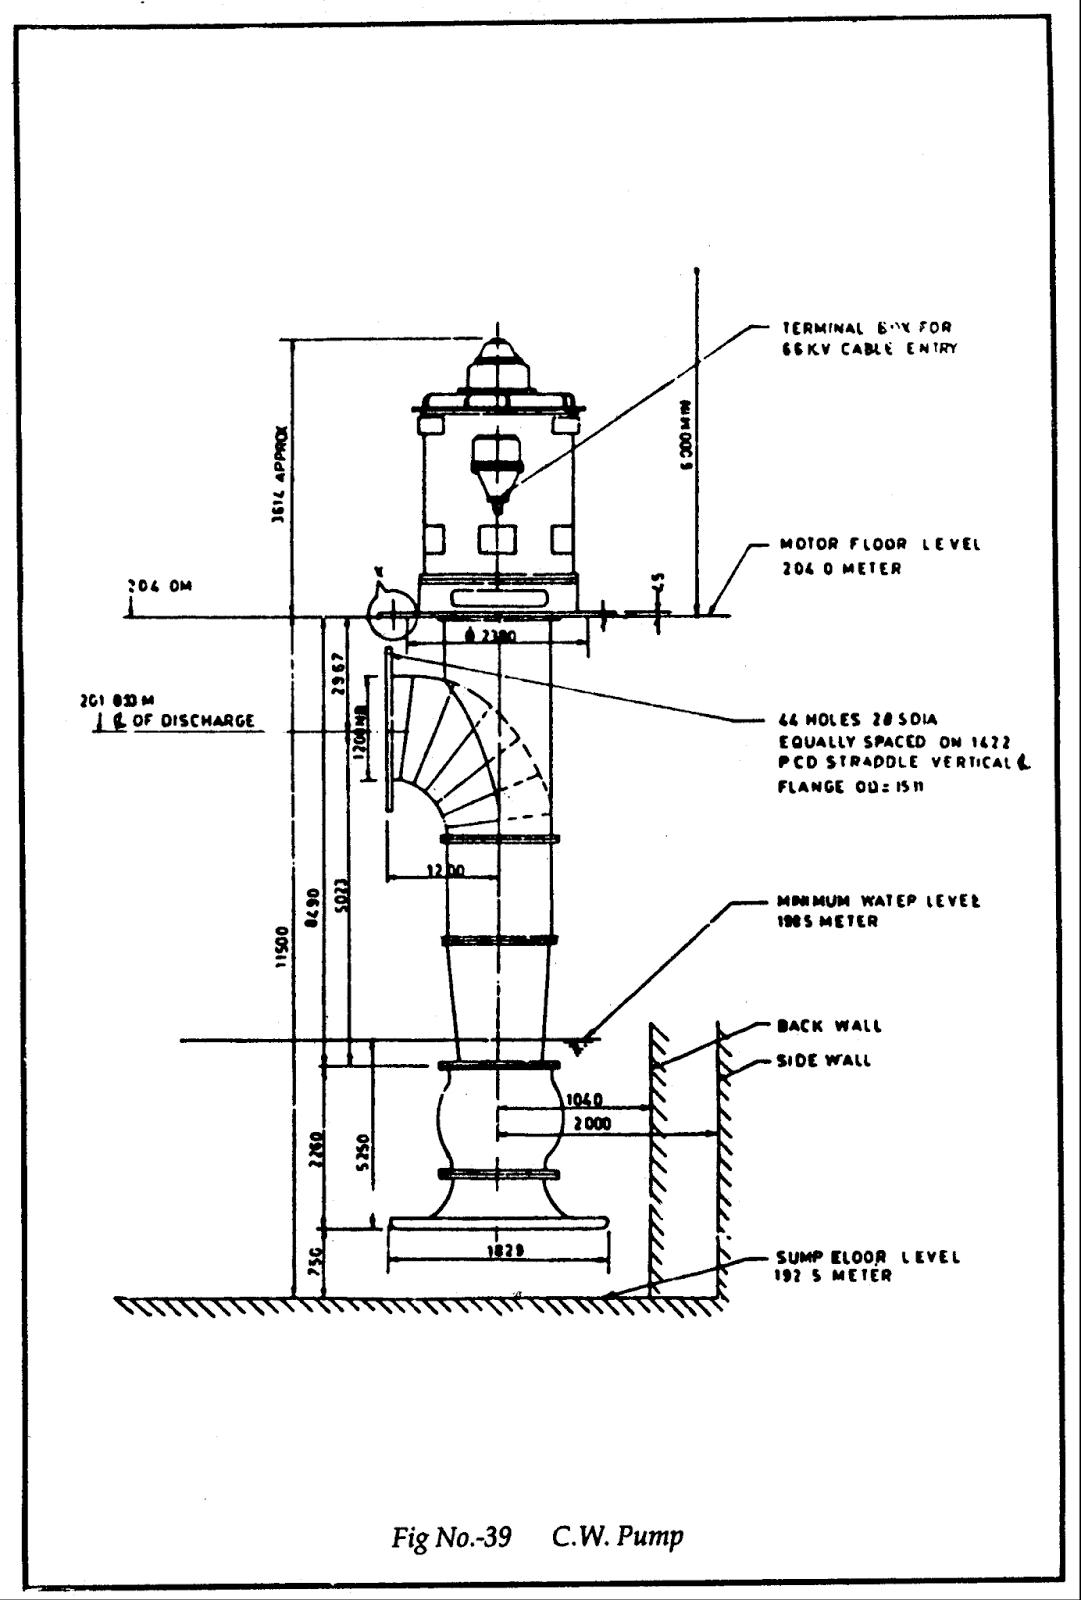 Turbine Auxiliaries Arrangement Of Turbine Auxiliaries